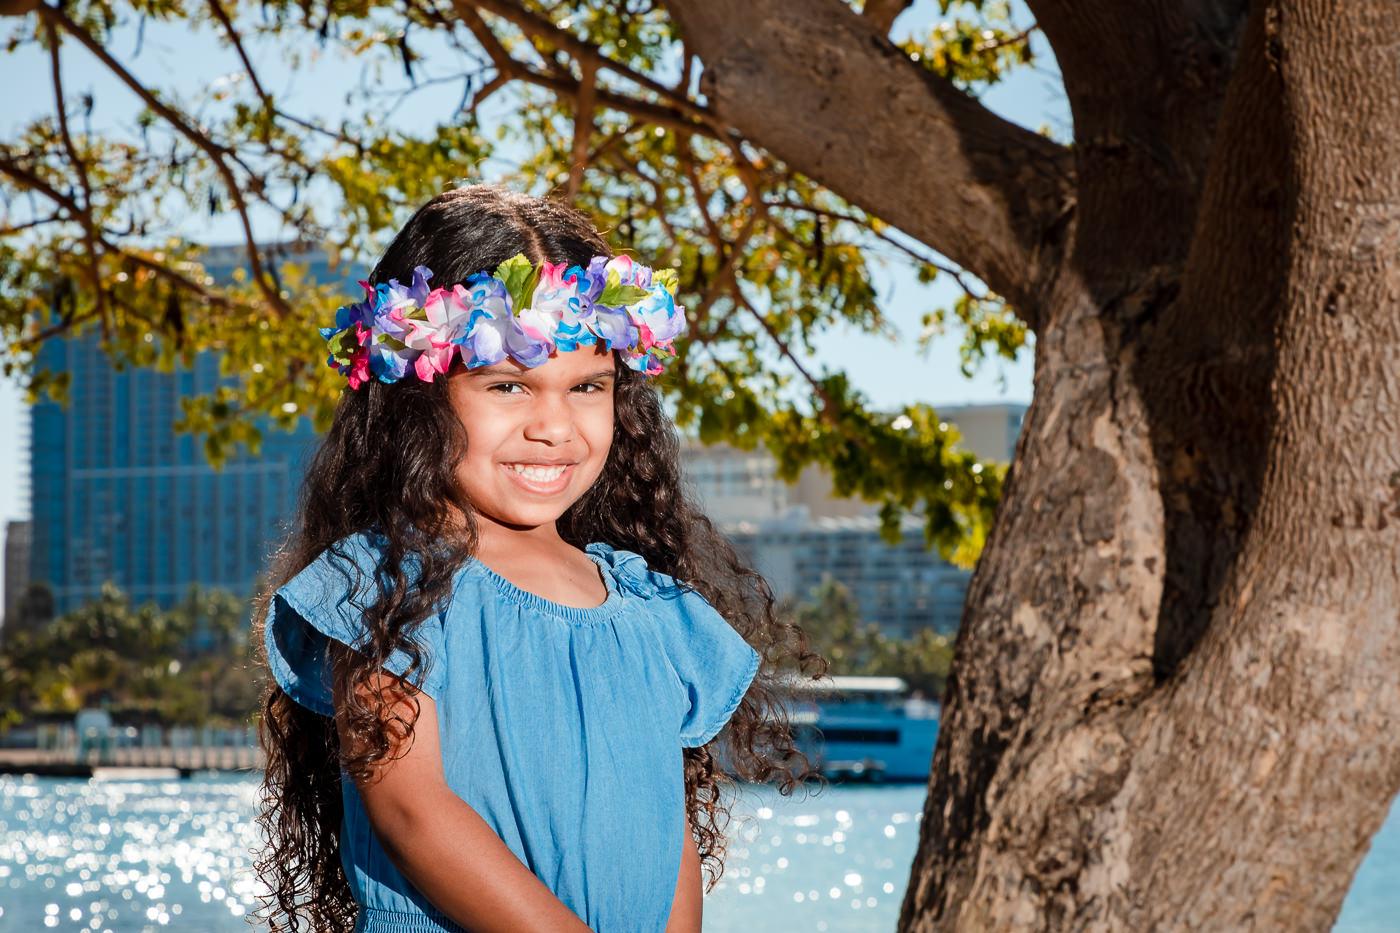 Oahu2019-3026.jpg